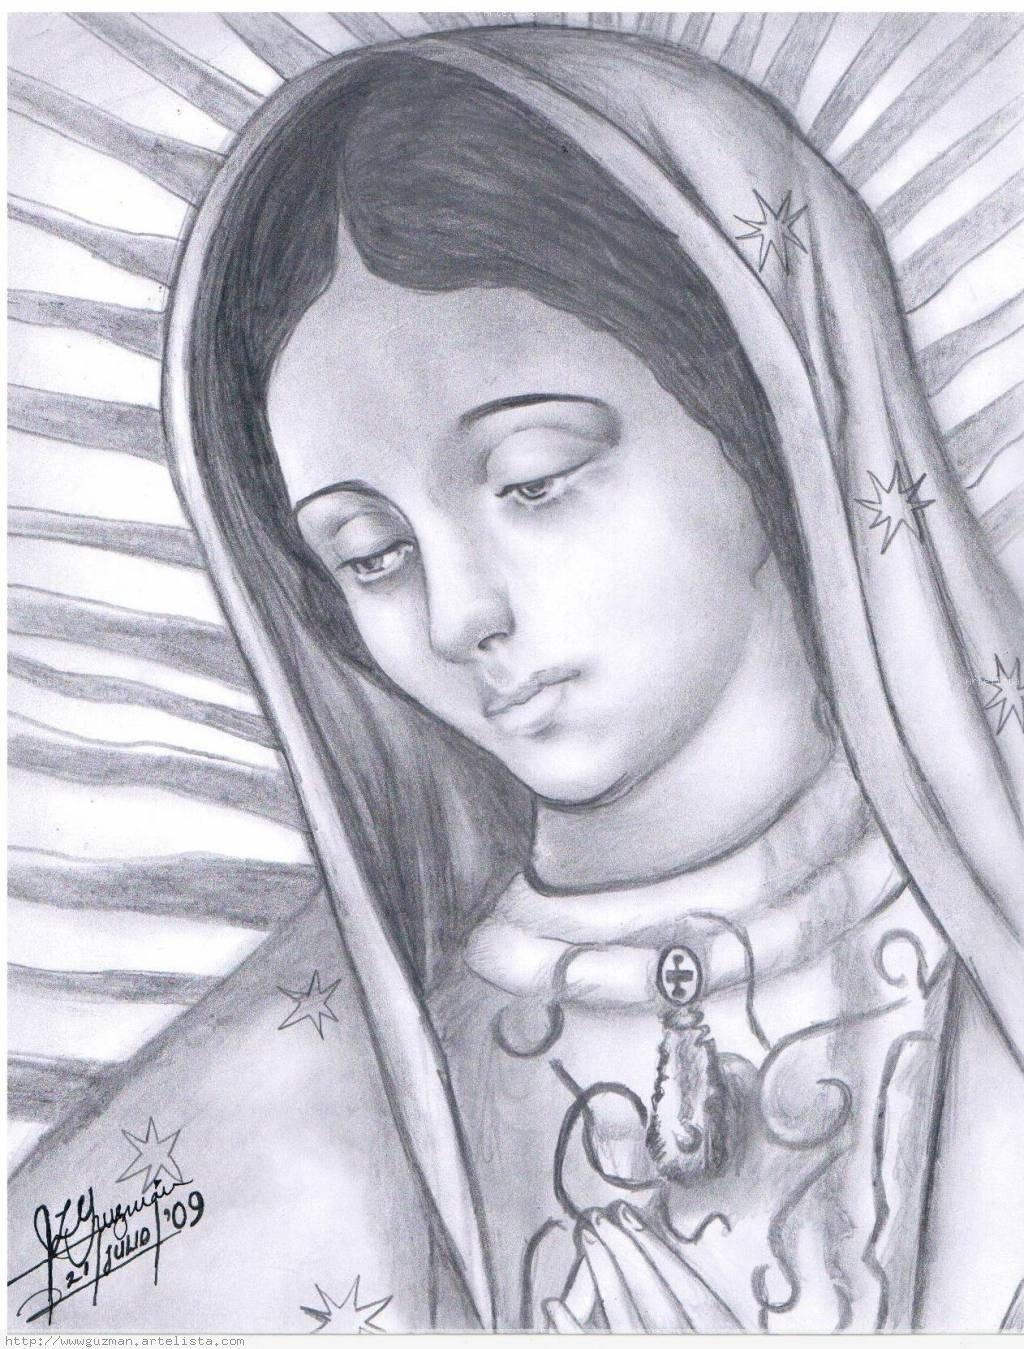 virgen de guadalupe easy art paintings - Google Search | virgen de ...